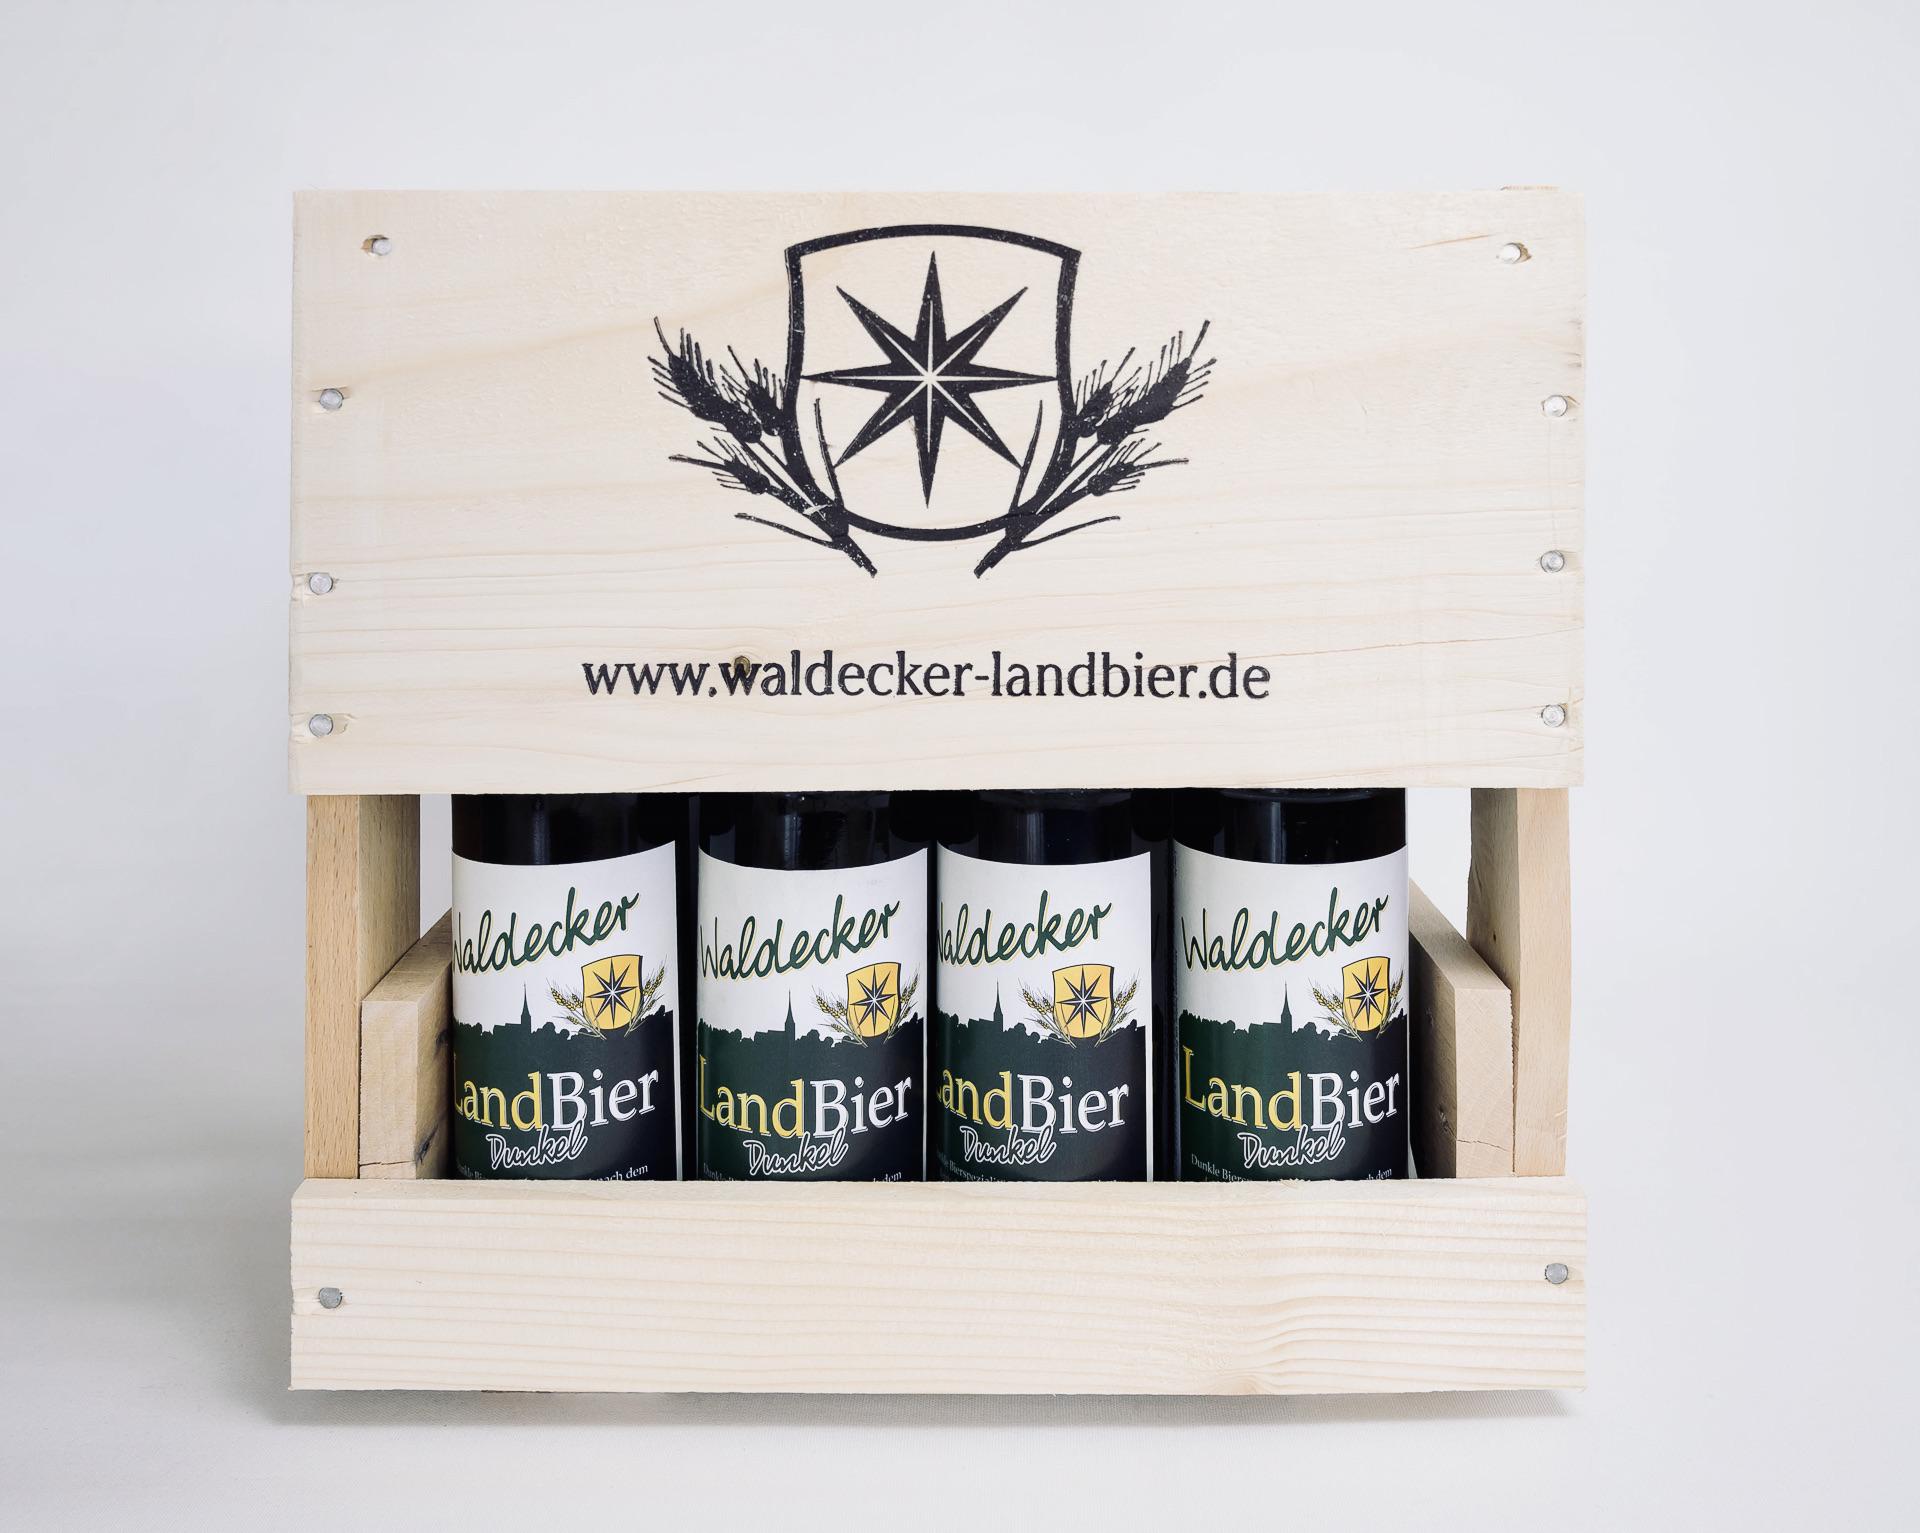 Waldecker Landbier, Waldecker Bier, Bierkiste, Holzkiste